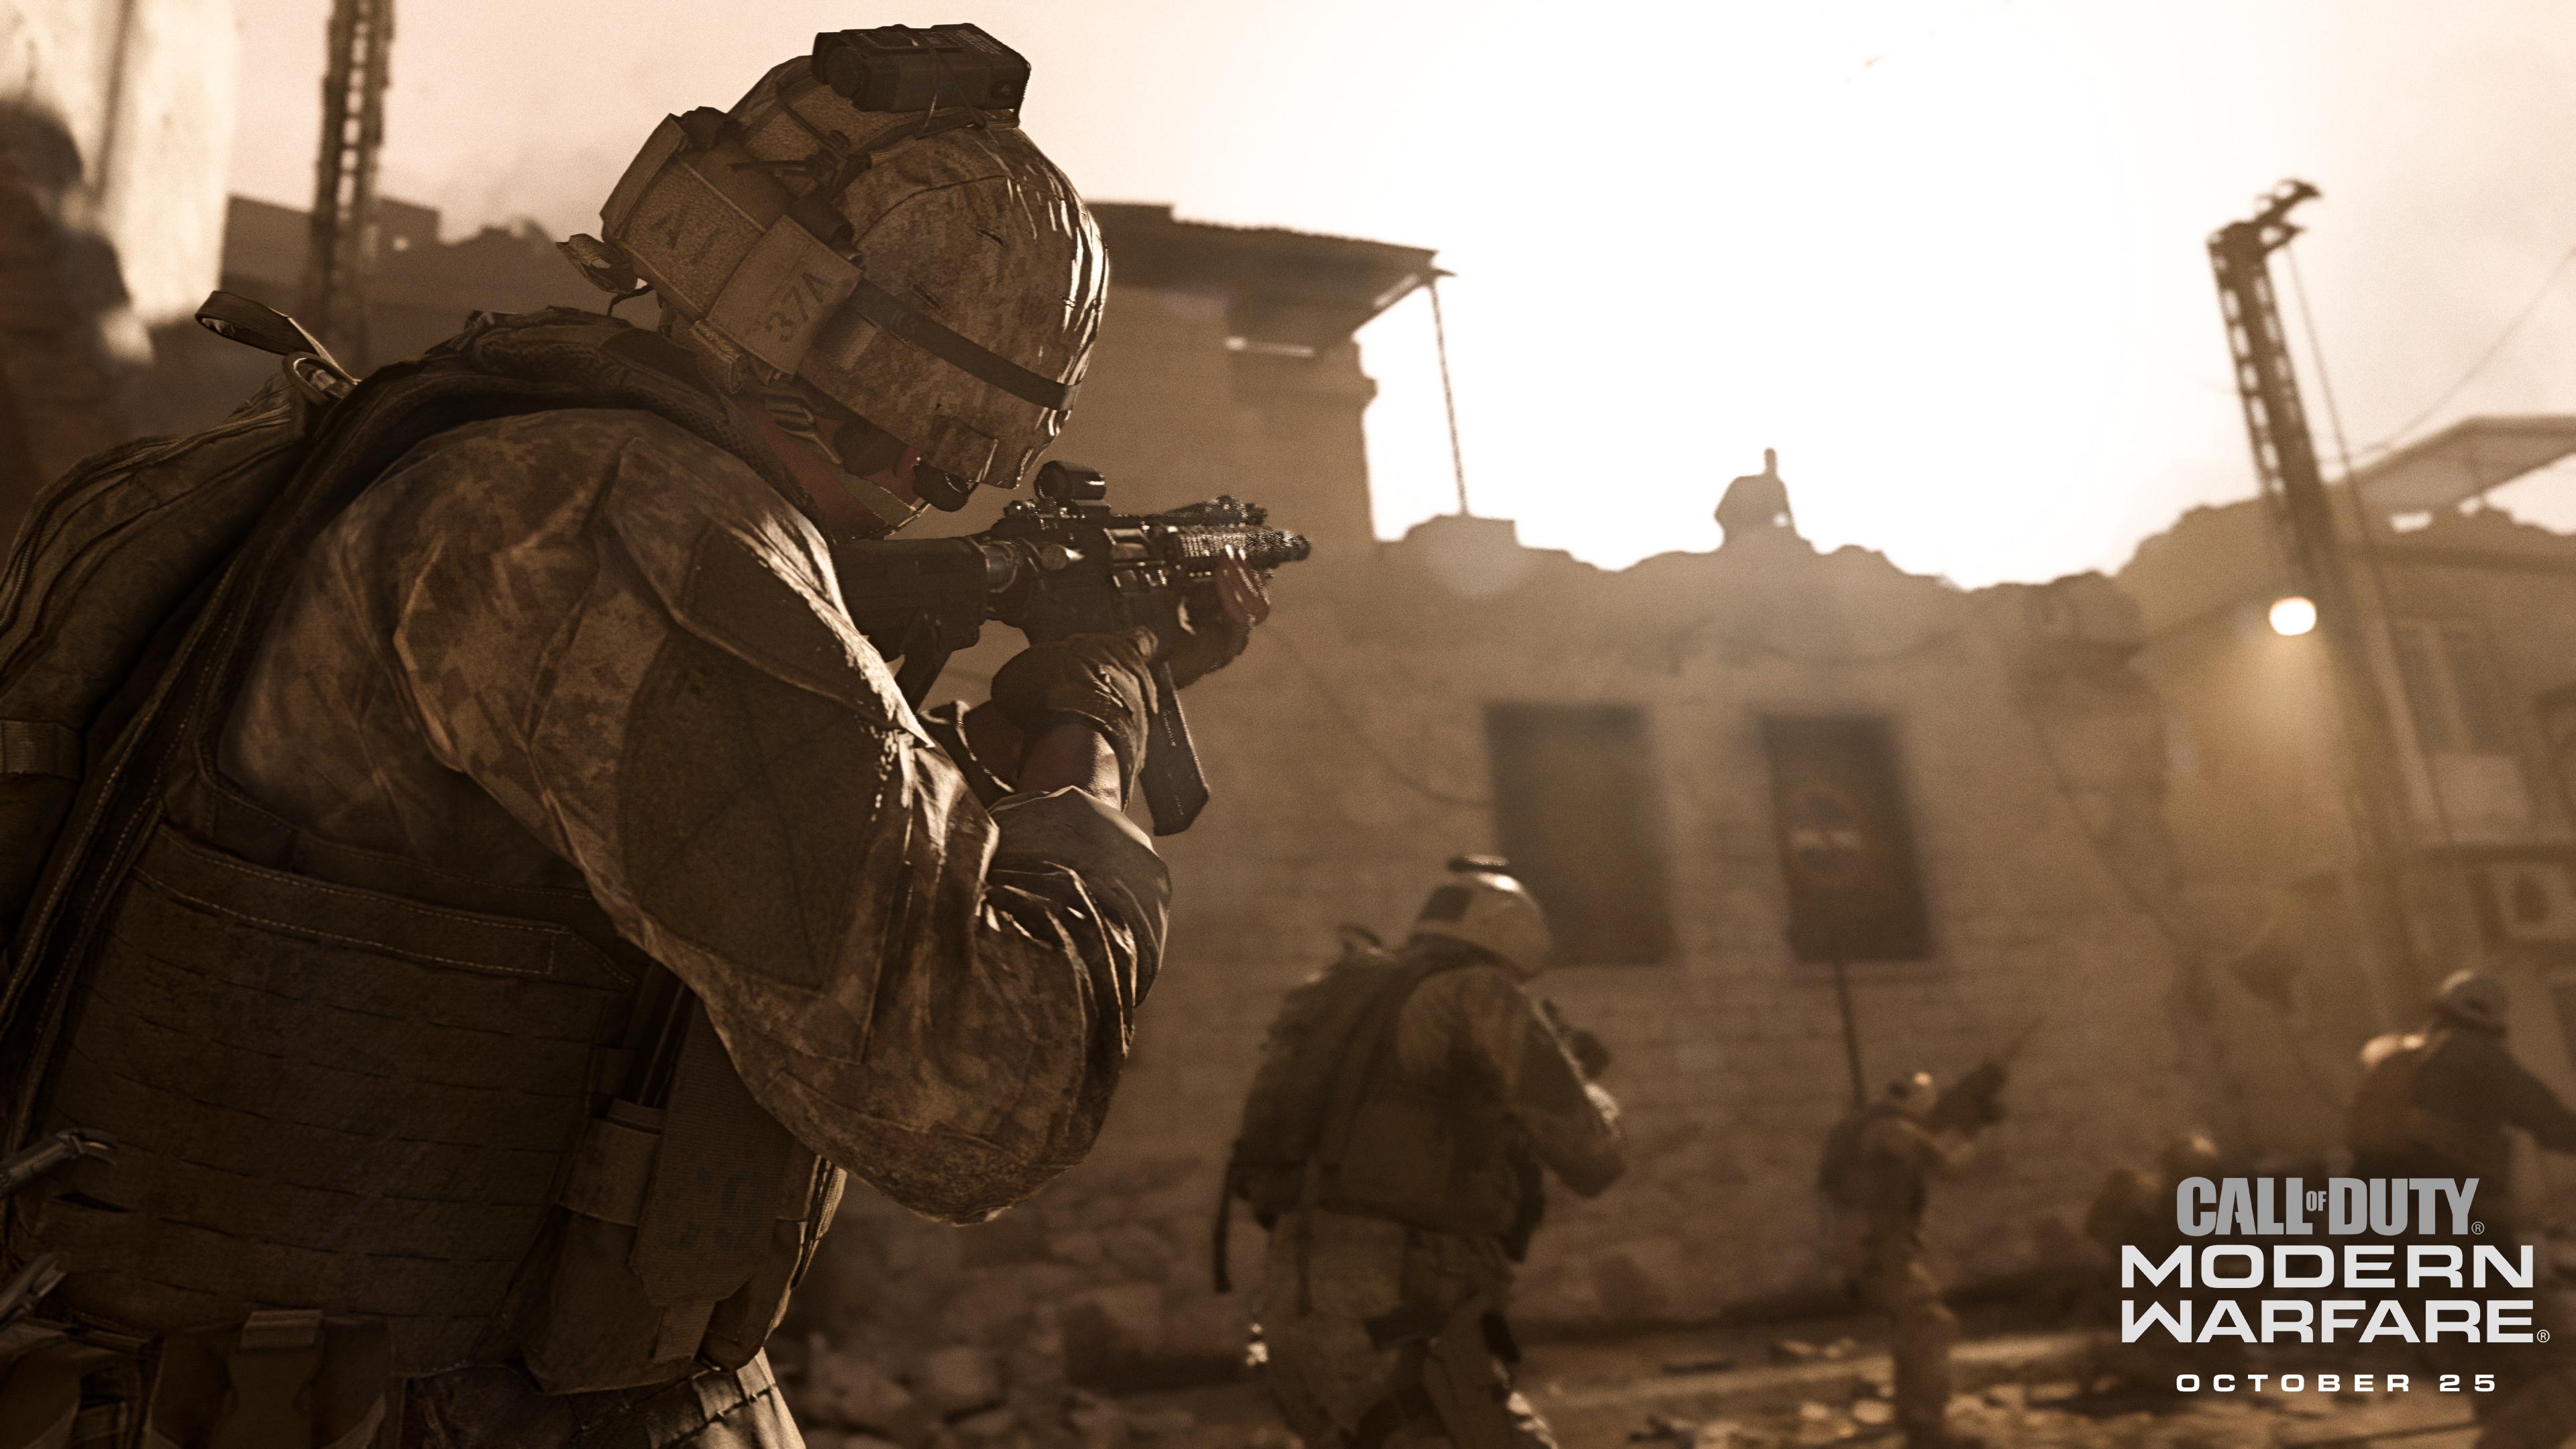 Call of Duty: Modern Warfare 2019: no season pass, crossplay